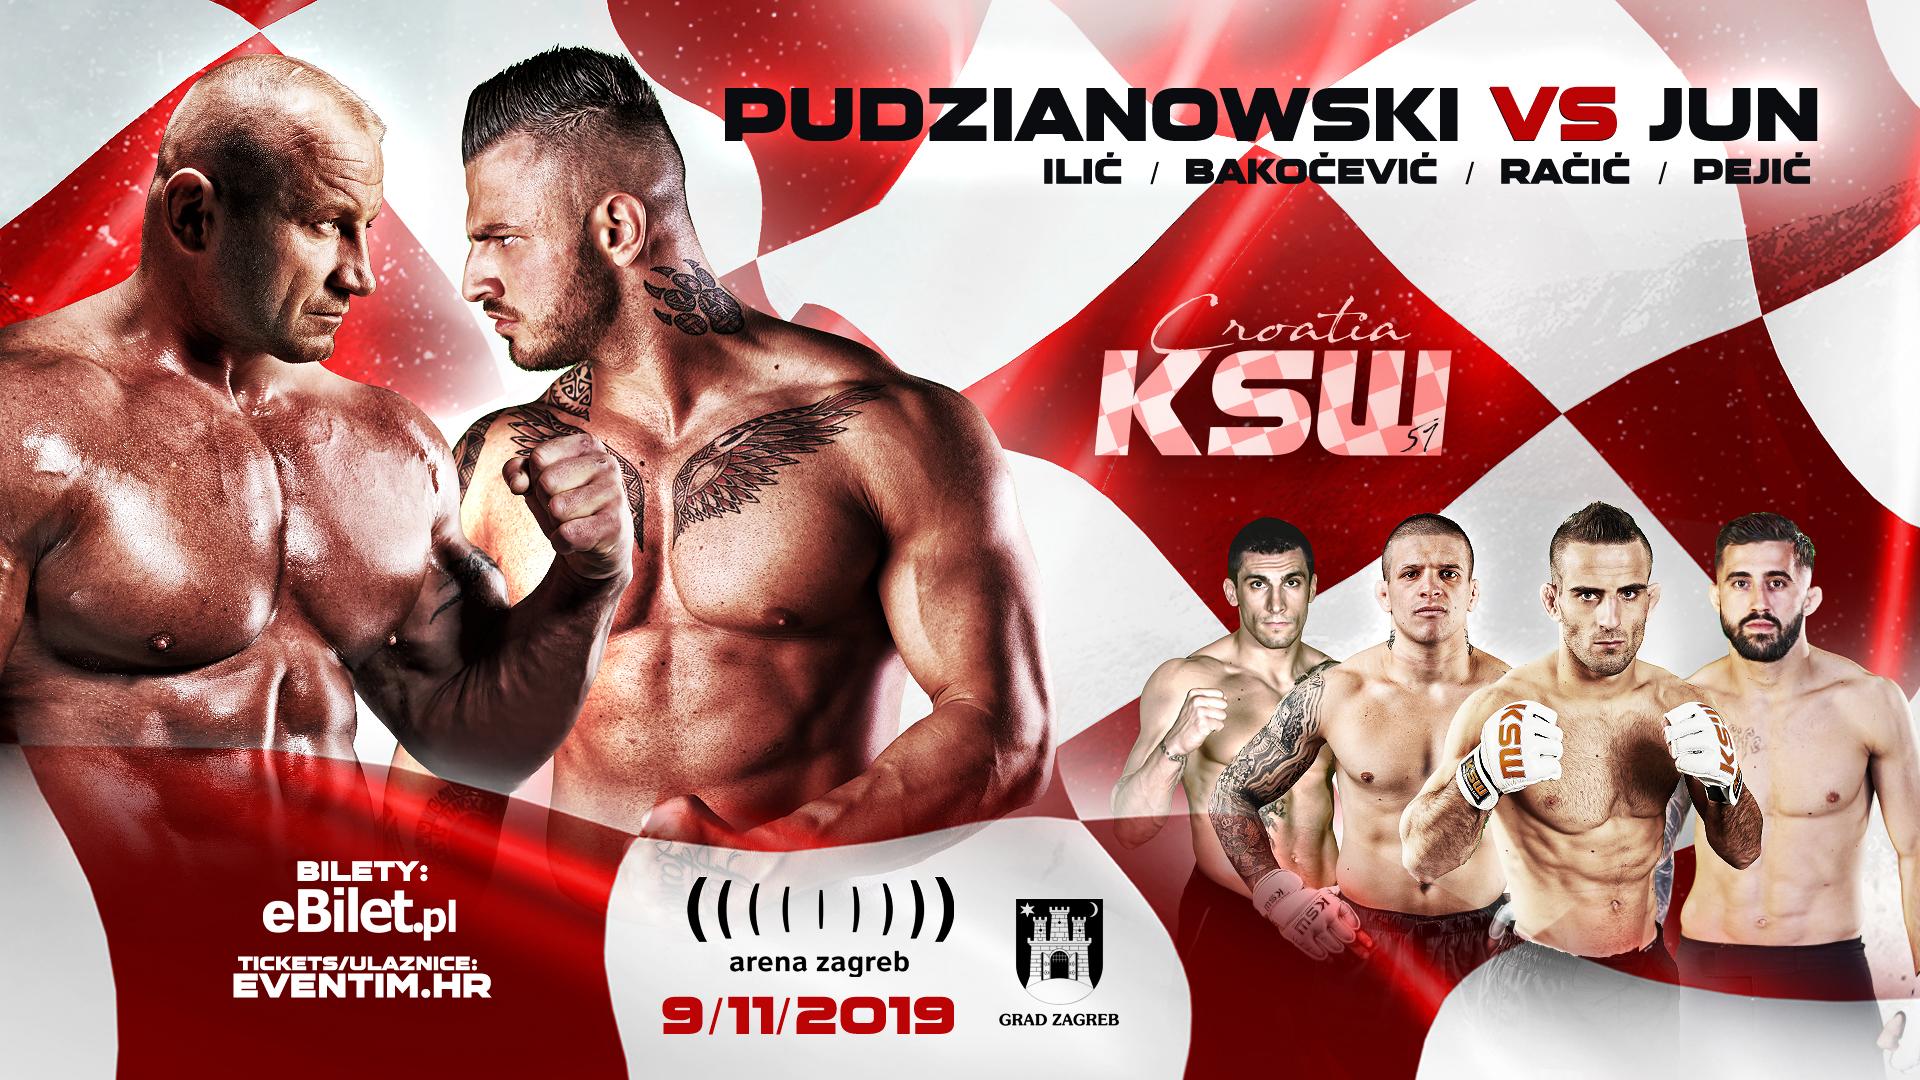 The Devil vs. The Psycho in KSW 51 Co-Main Event - MMA